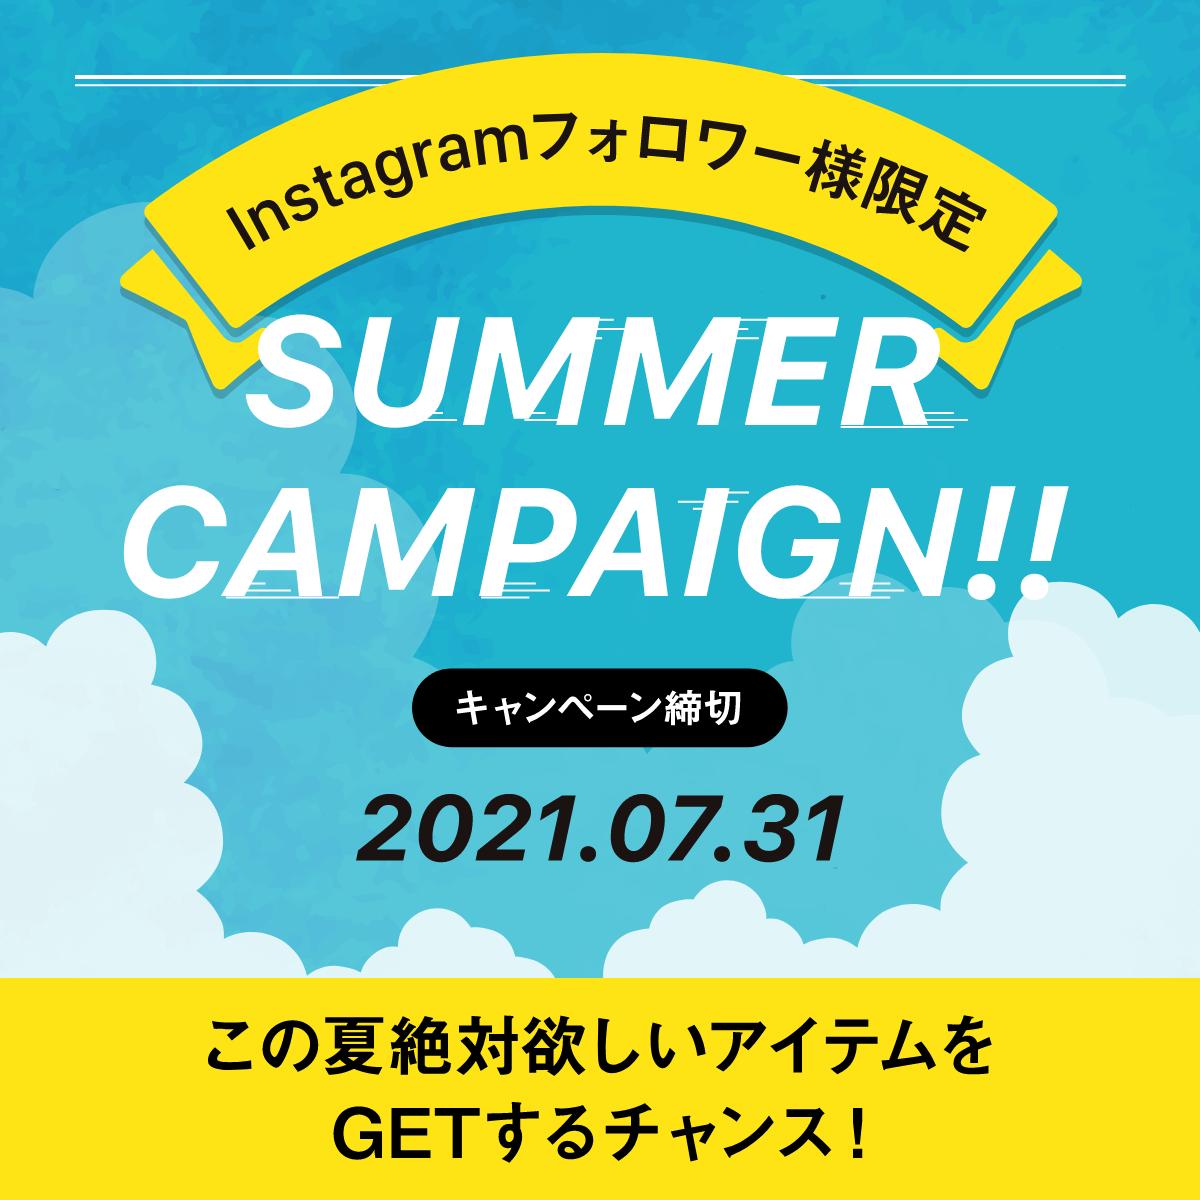 Instagramフォロワー様限定 SUMMER CAMPAIGN キャンペーン締切:2021.07.31